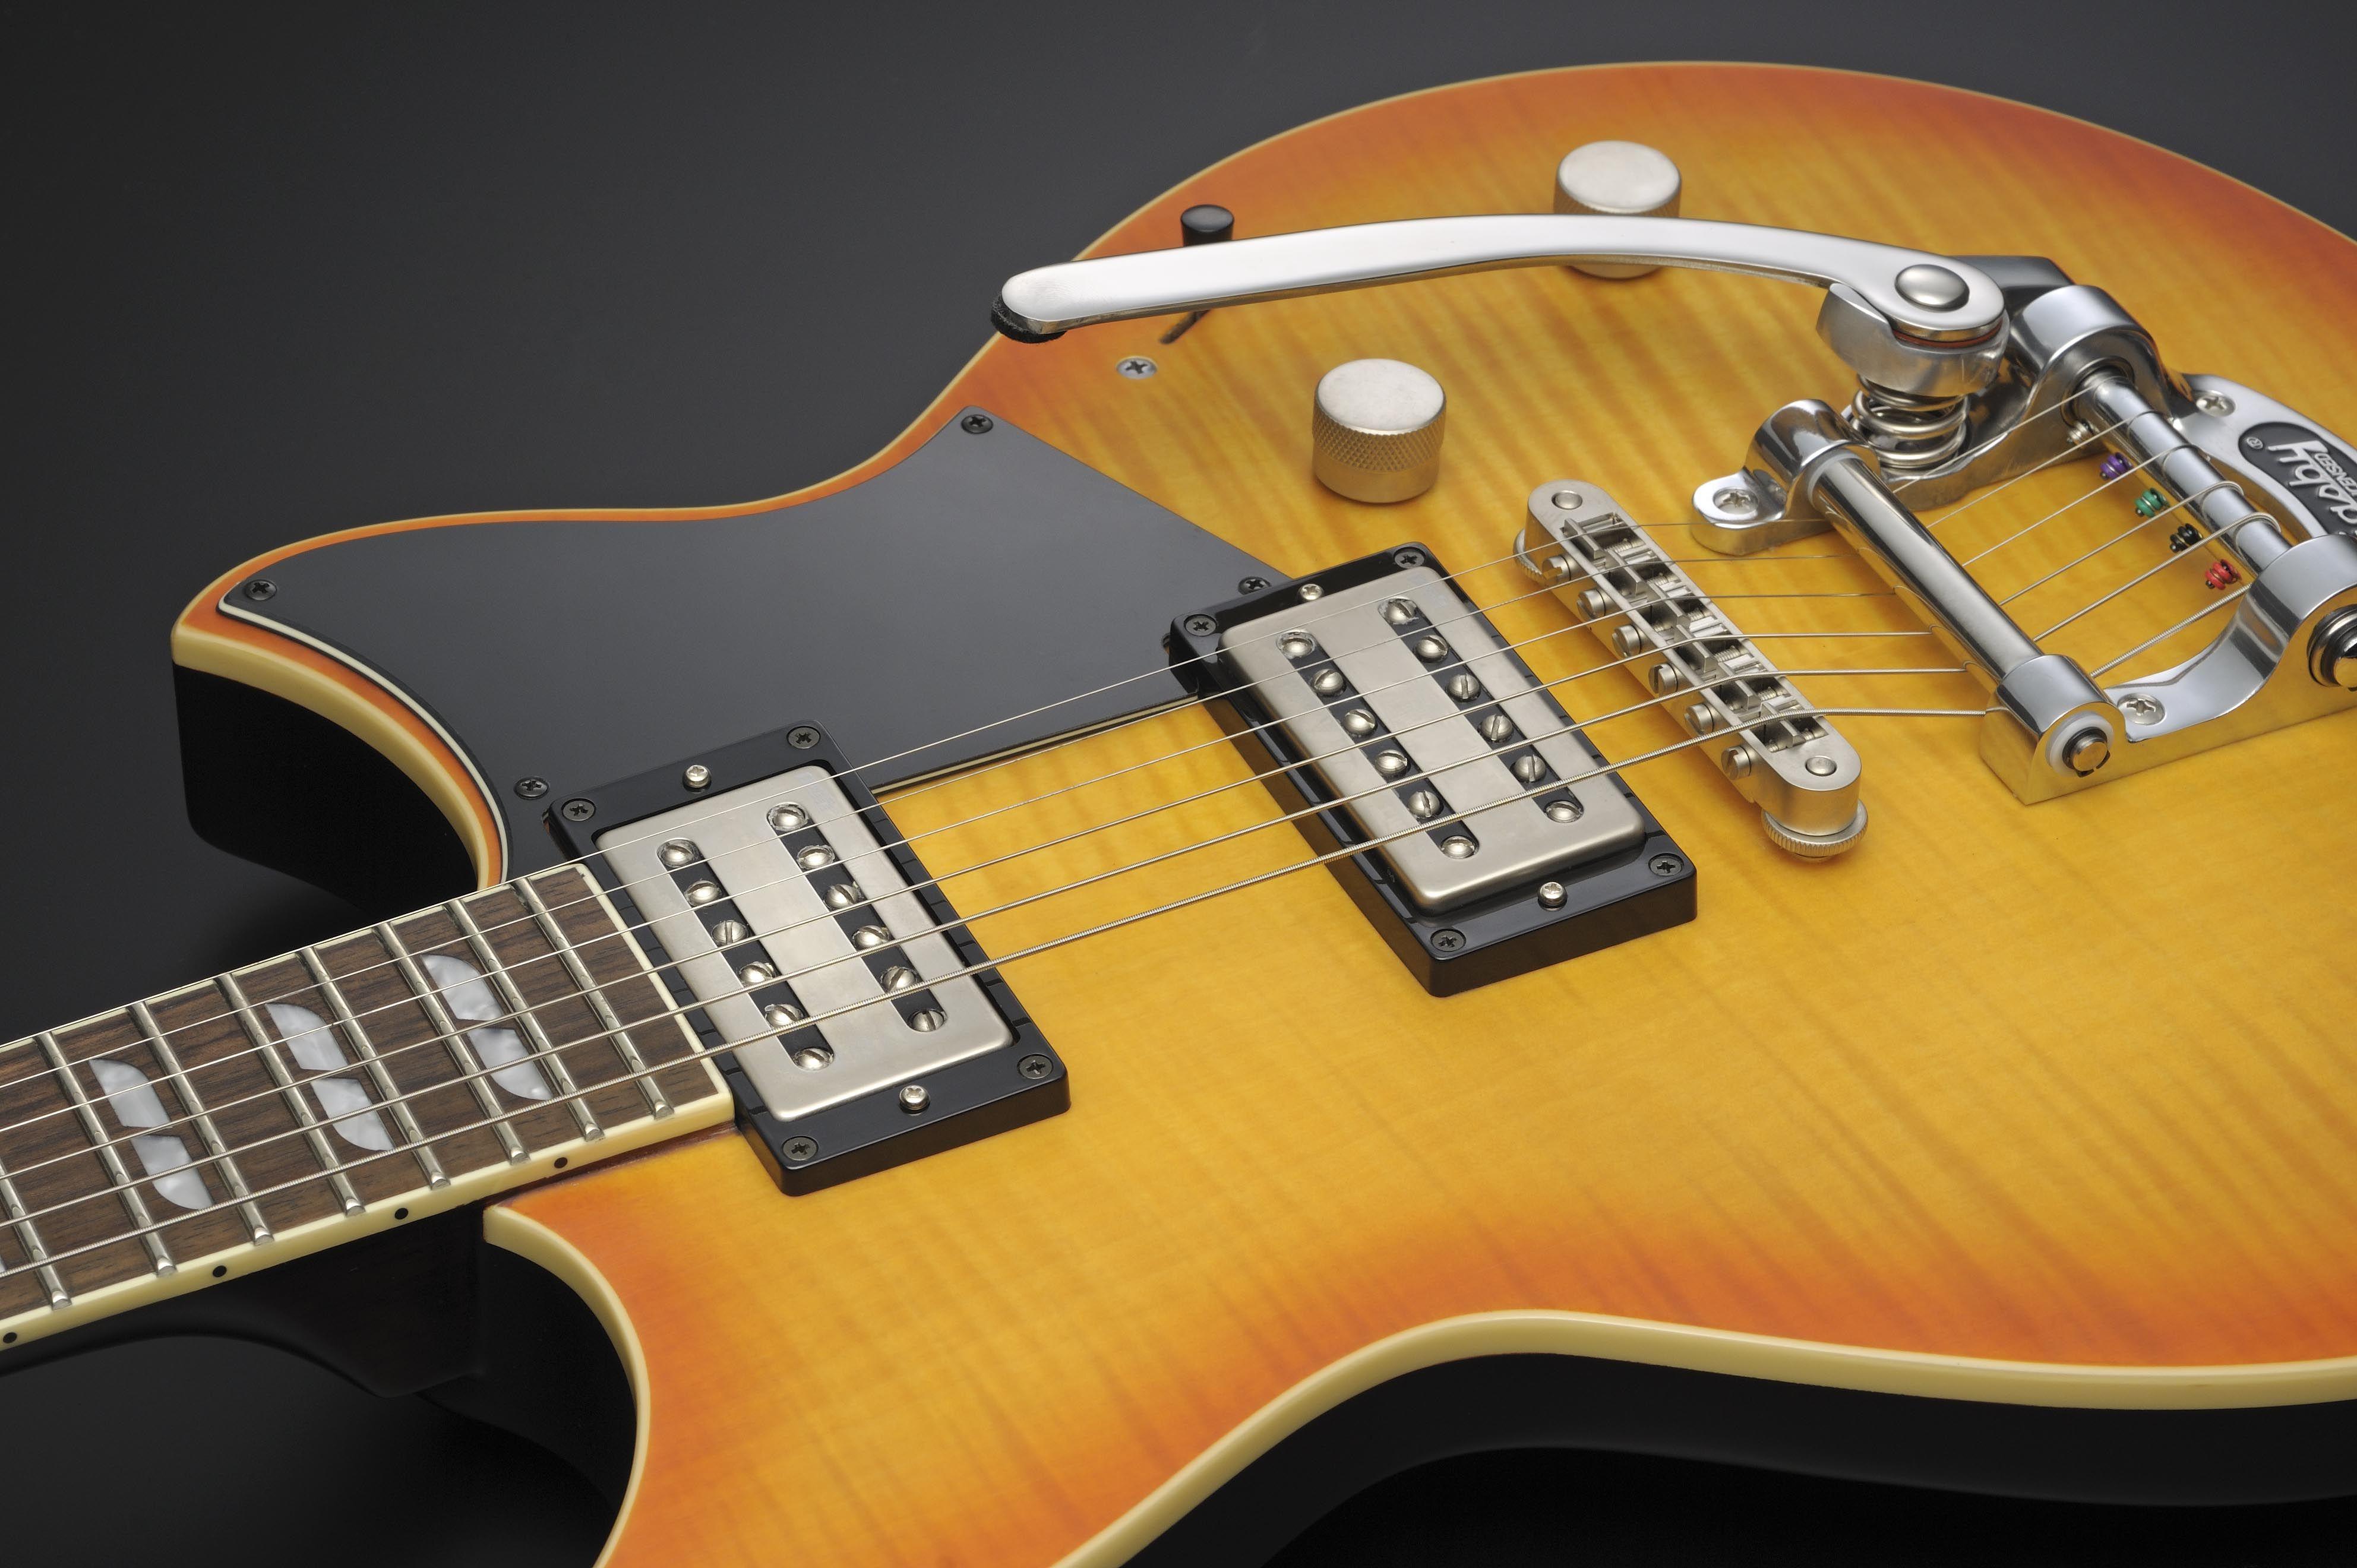 Yamaha Revstar 720B electric guitar Wall Fade with Bigsby B 50 tremolo & locking